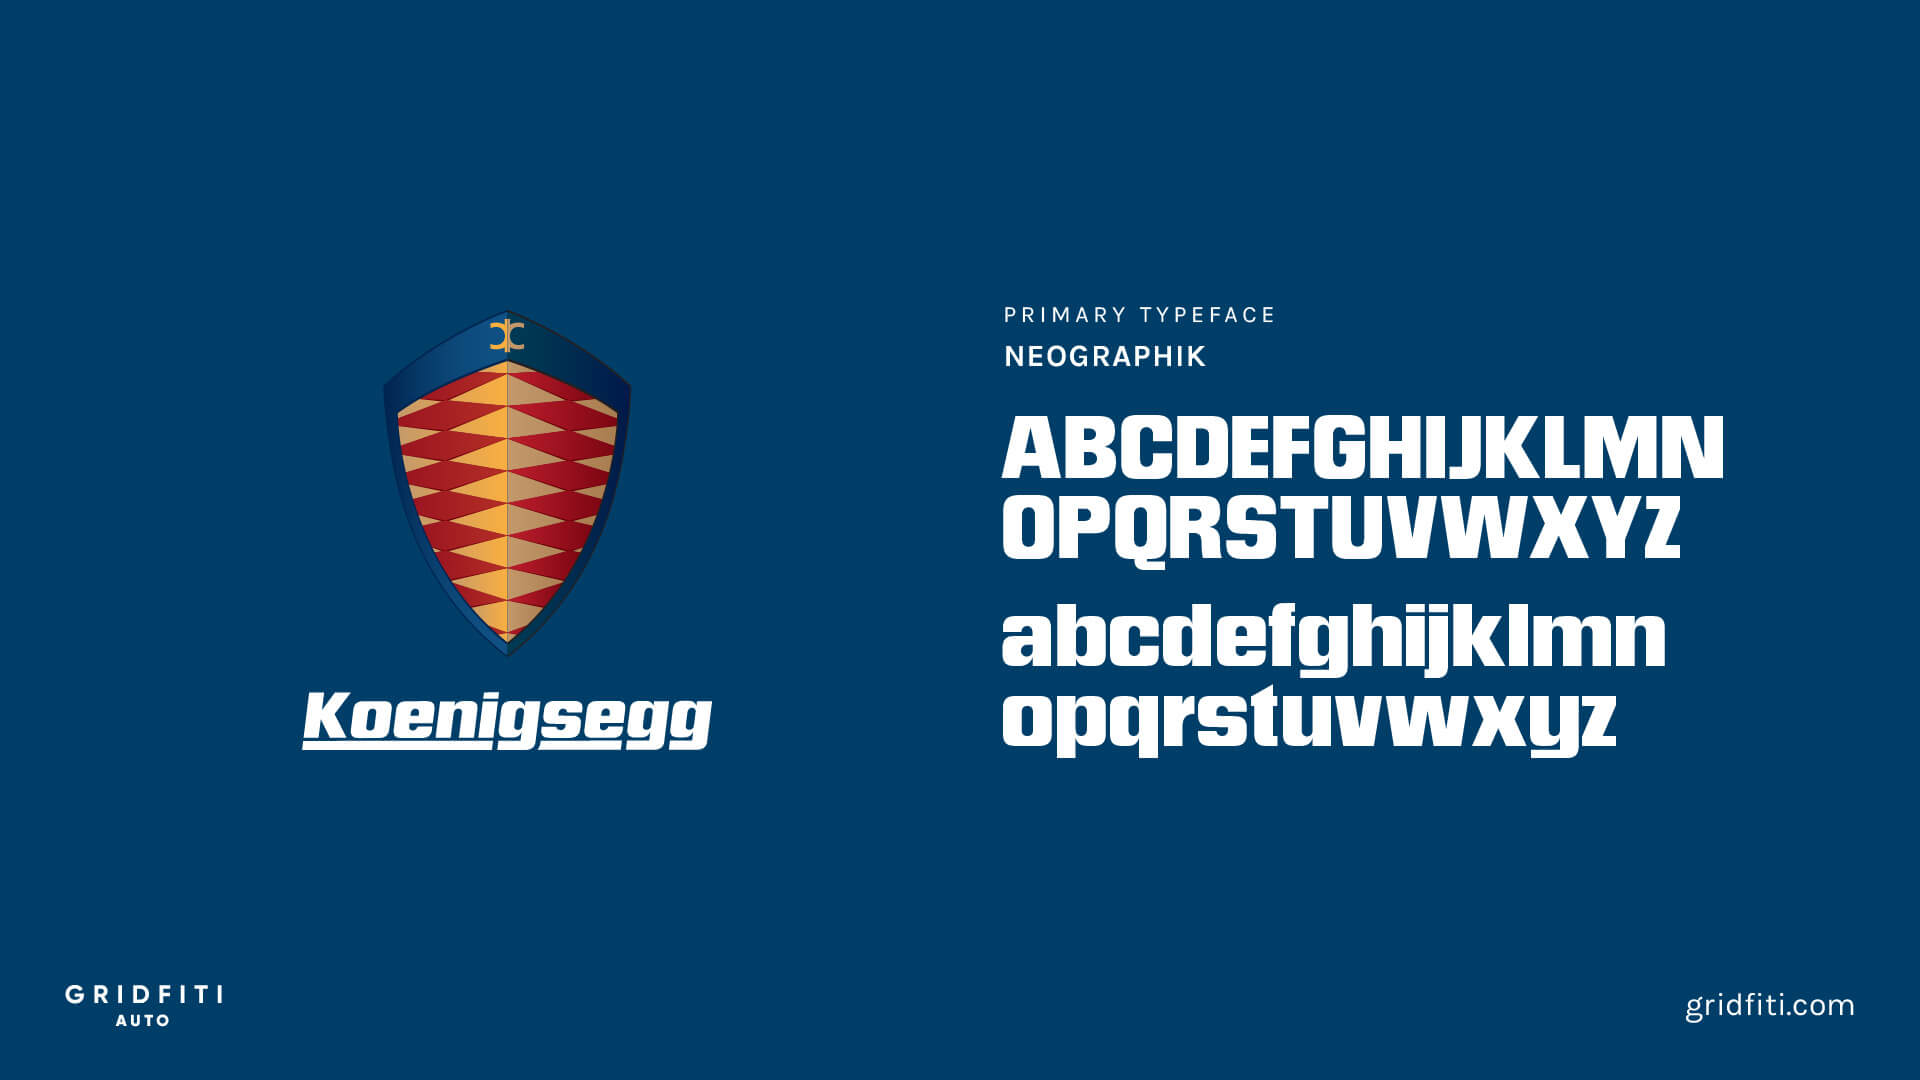 Koenigsegg Car Brand Font